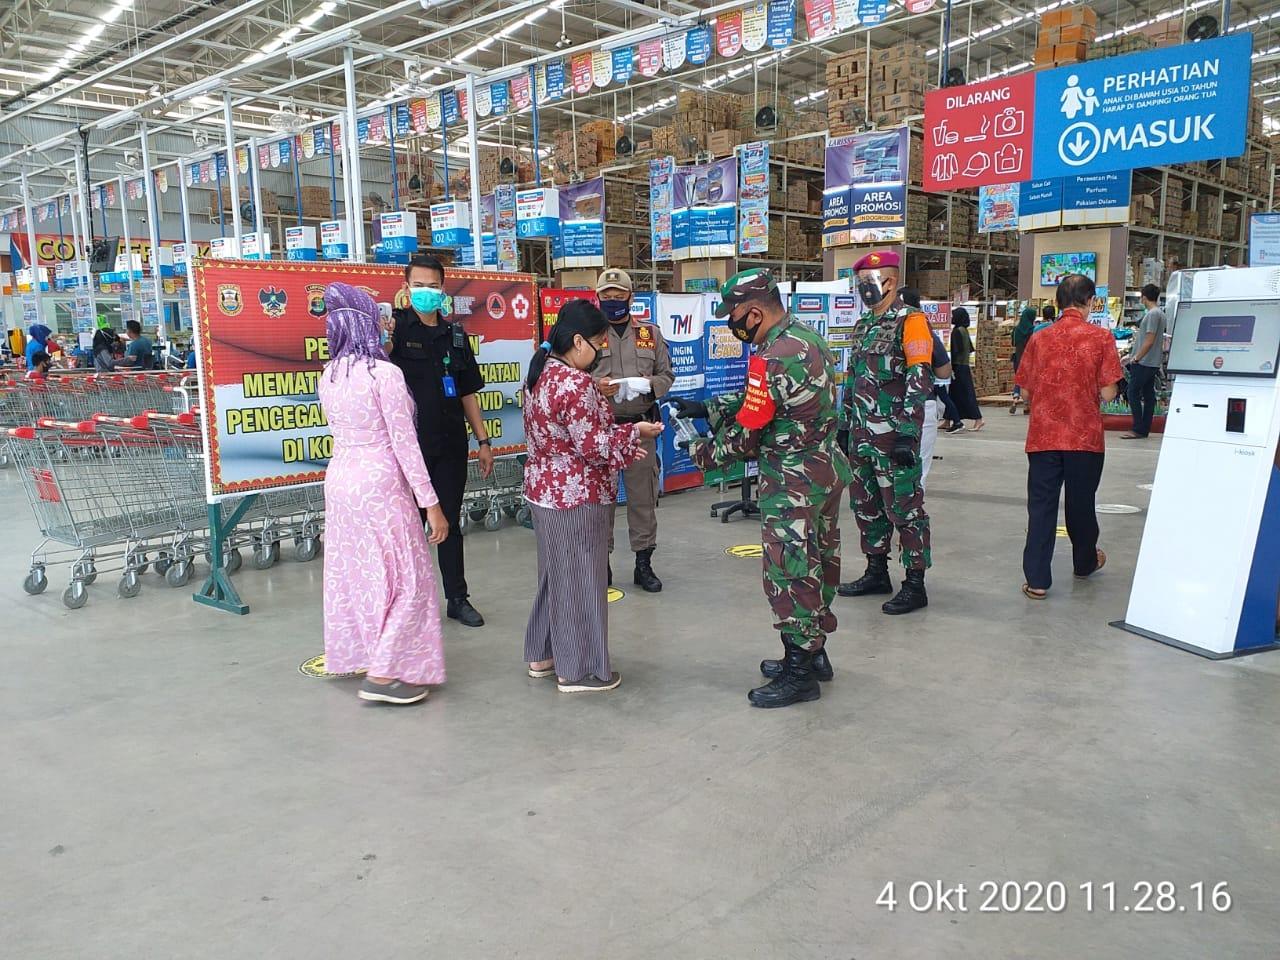 Satgas terpadu percepatan Penanganan Covid-19 Kota Bandar Lampung melaksanakan penegakan disiplin protokol kesehatan di Indogrosir